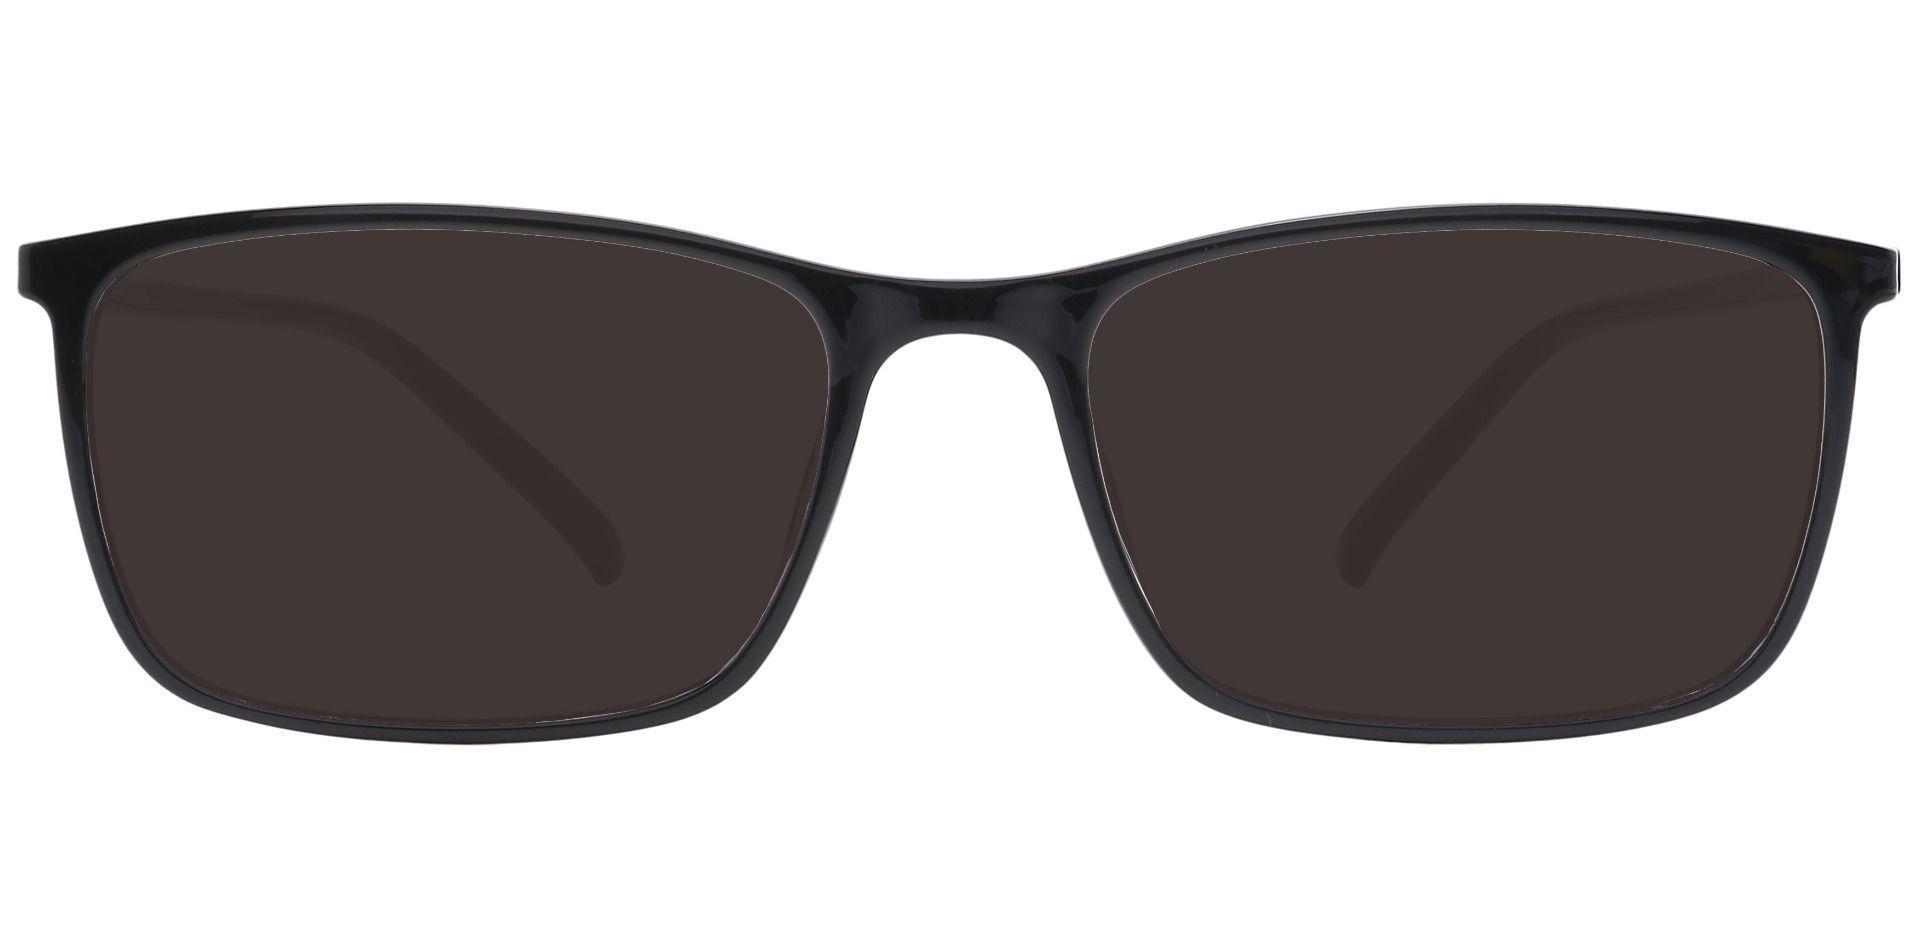 Fuji Rectangle Prescription Sunglasses - Black Frame With Gray Lenses